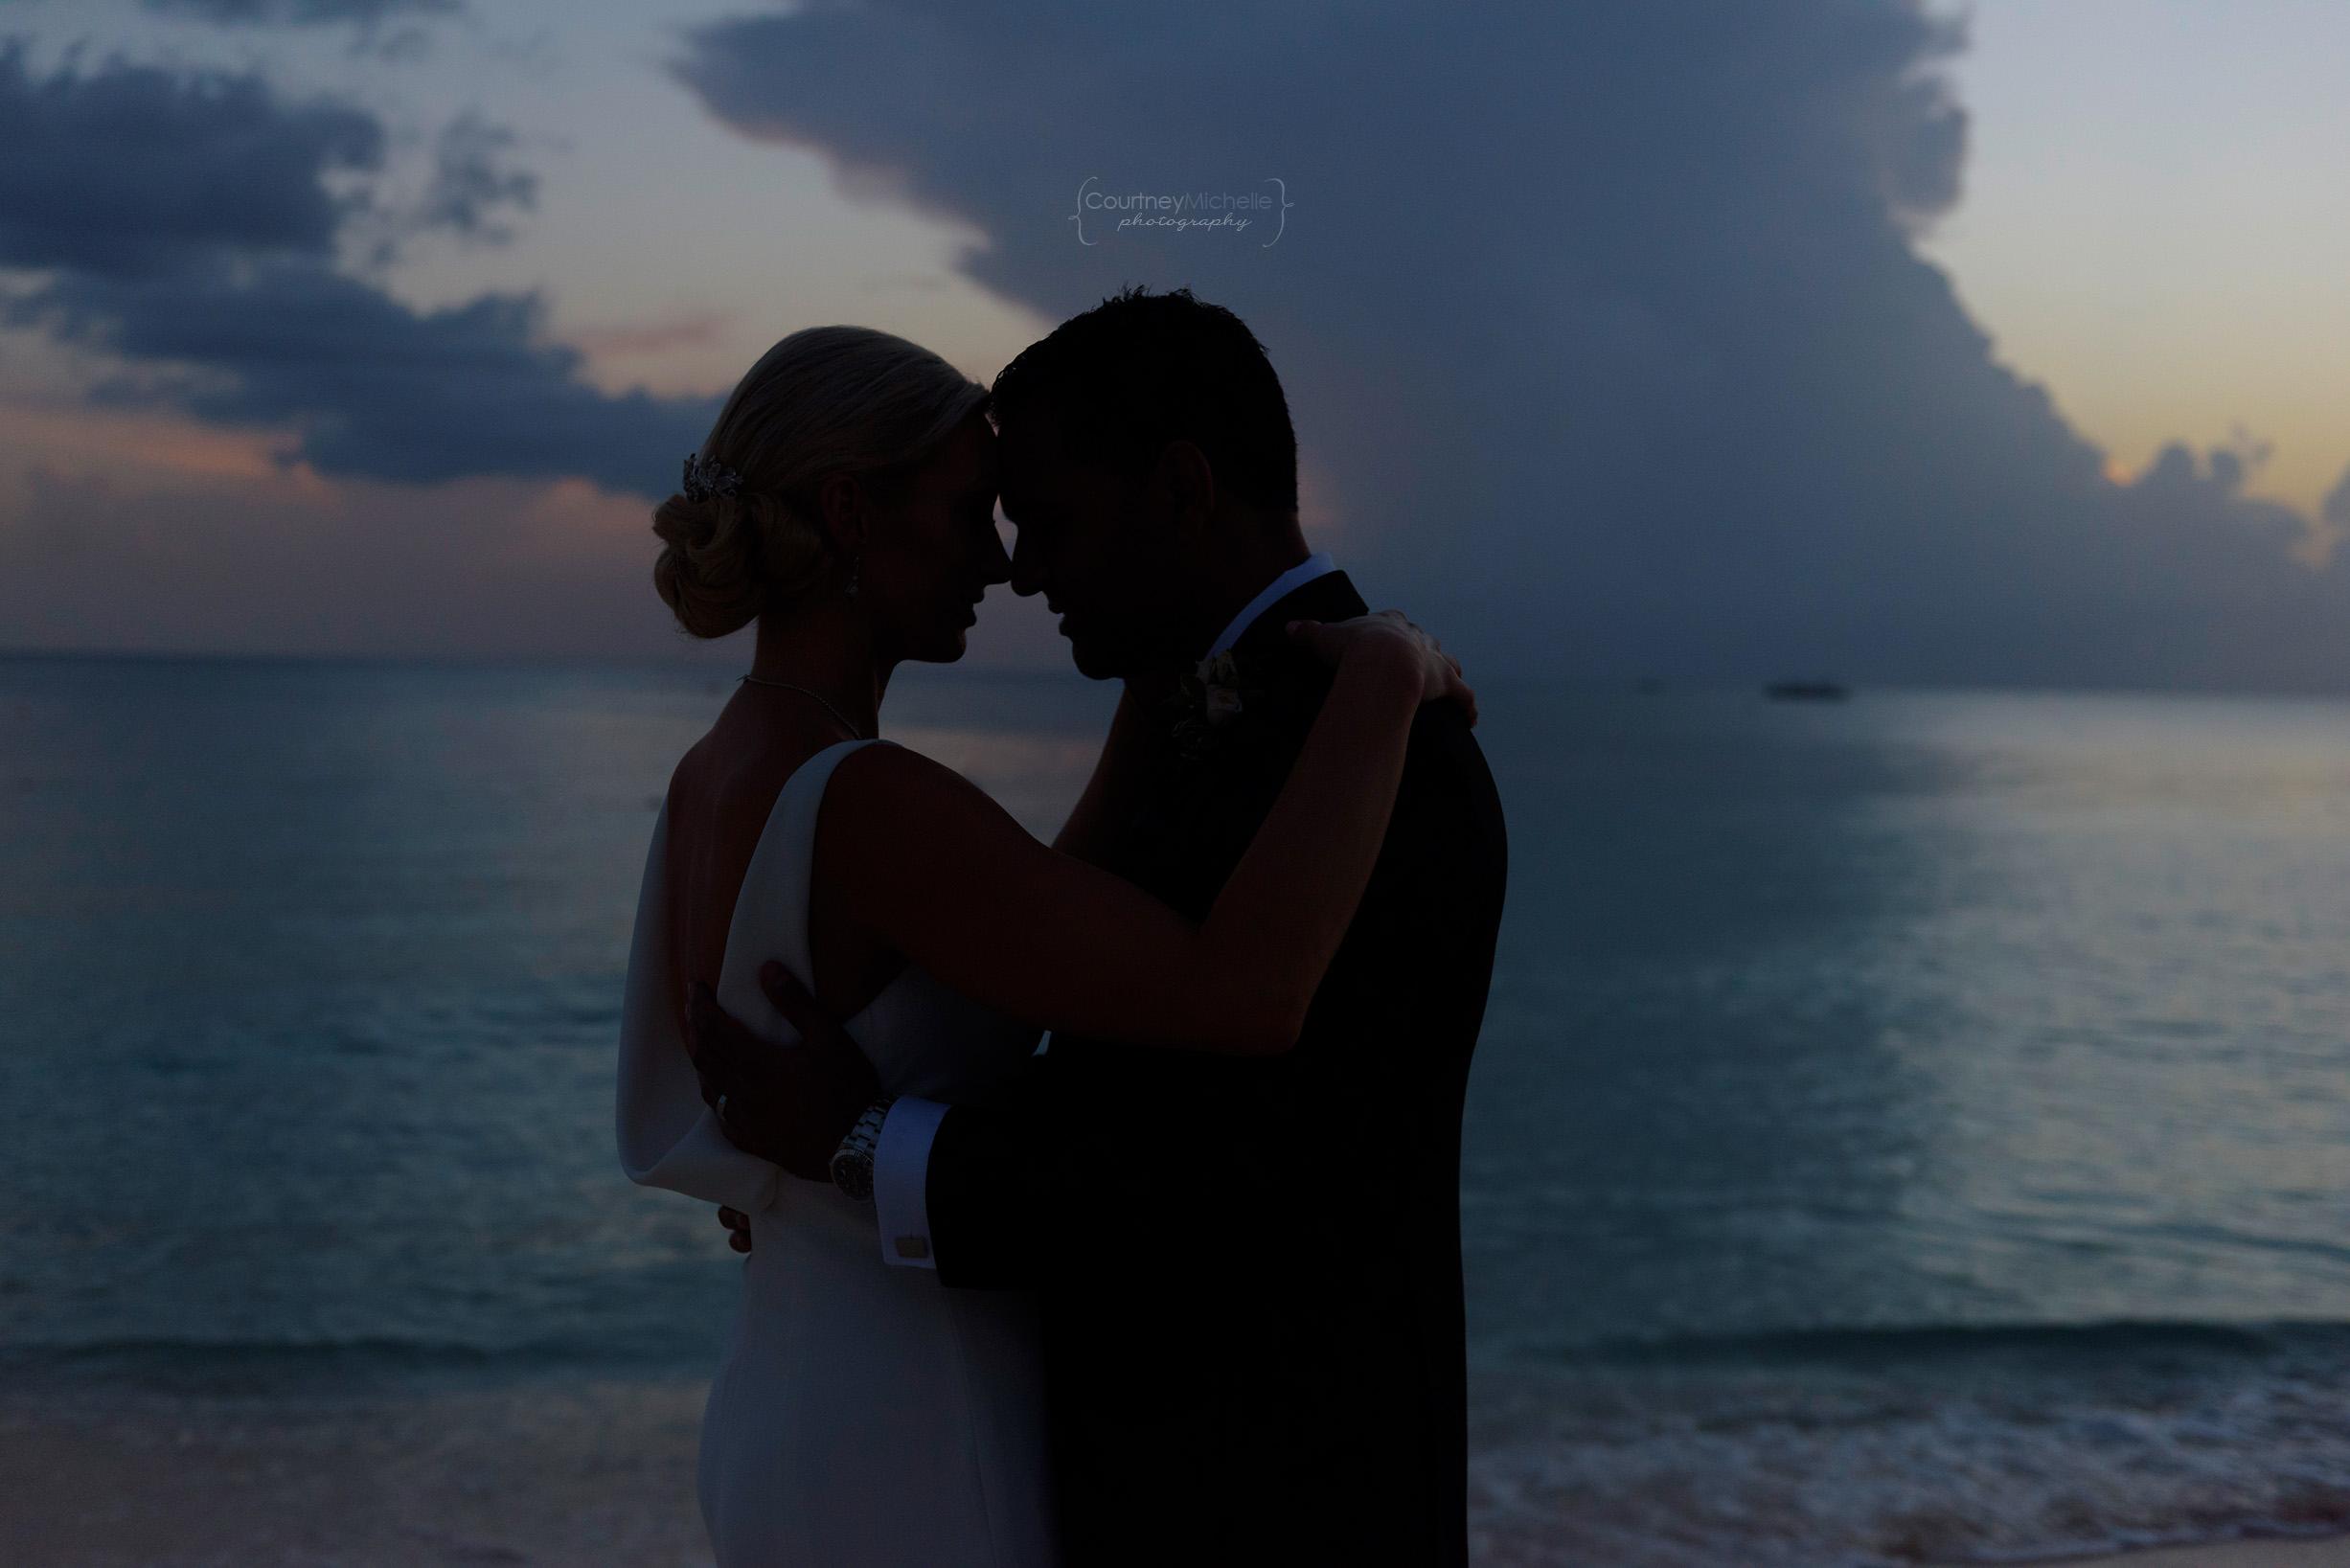 bride-and-groom-portrait-grand-cayman-beach-wedding-photography-by-courtney-laper©CopyrightCMP-LeaAnneRaj-7977.jpg